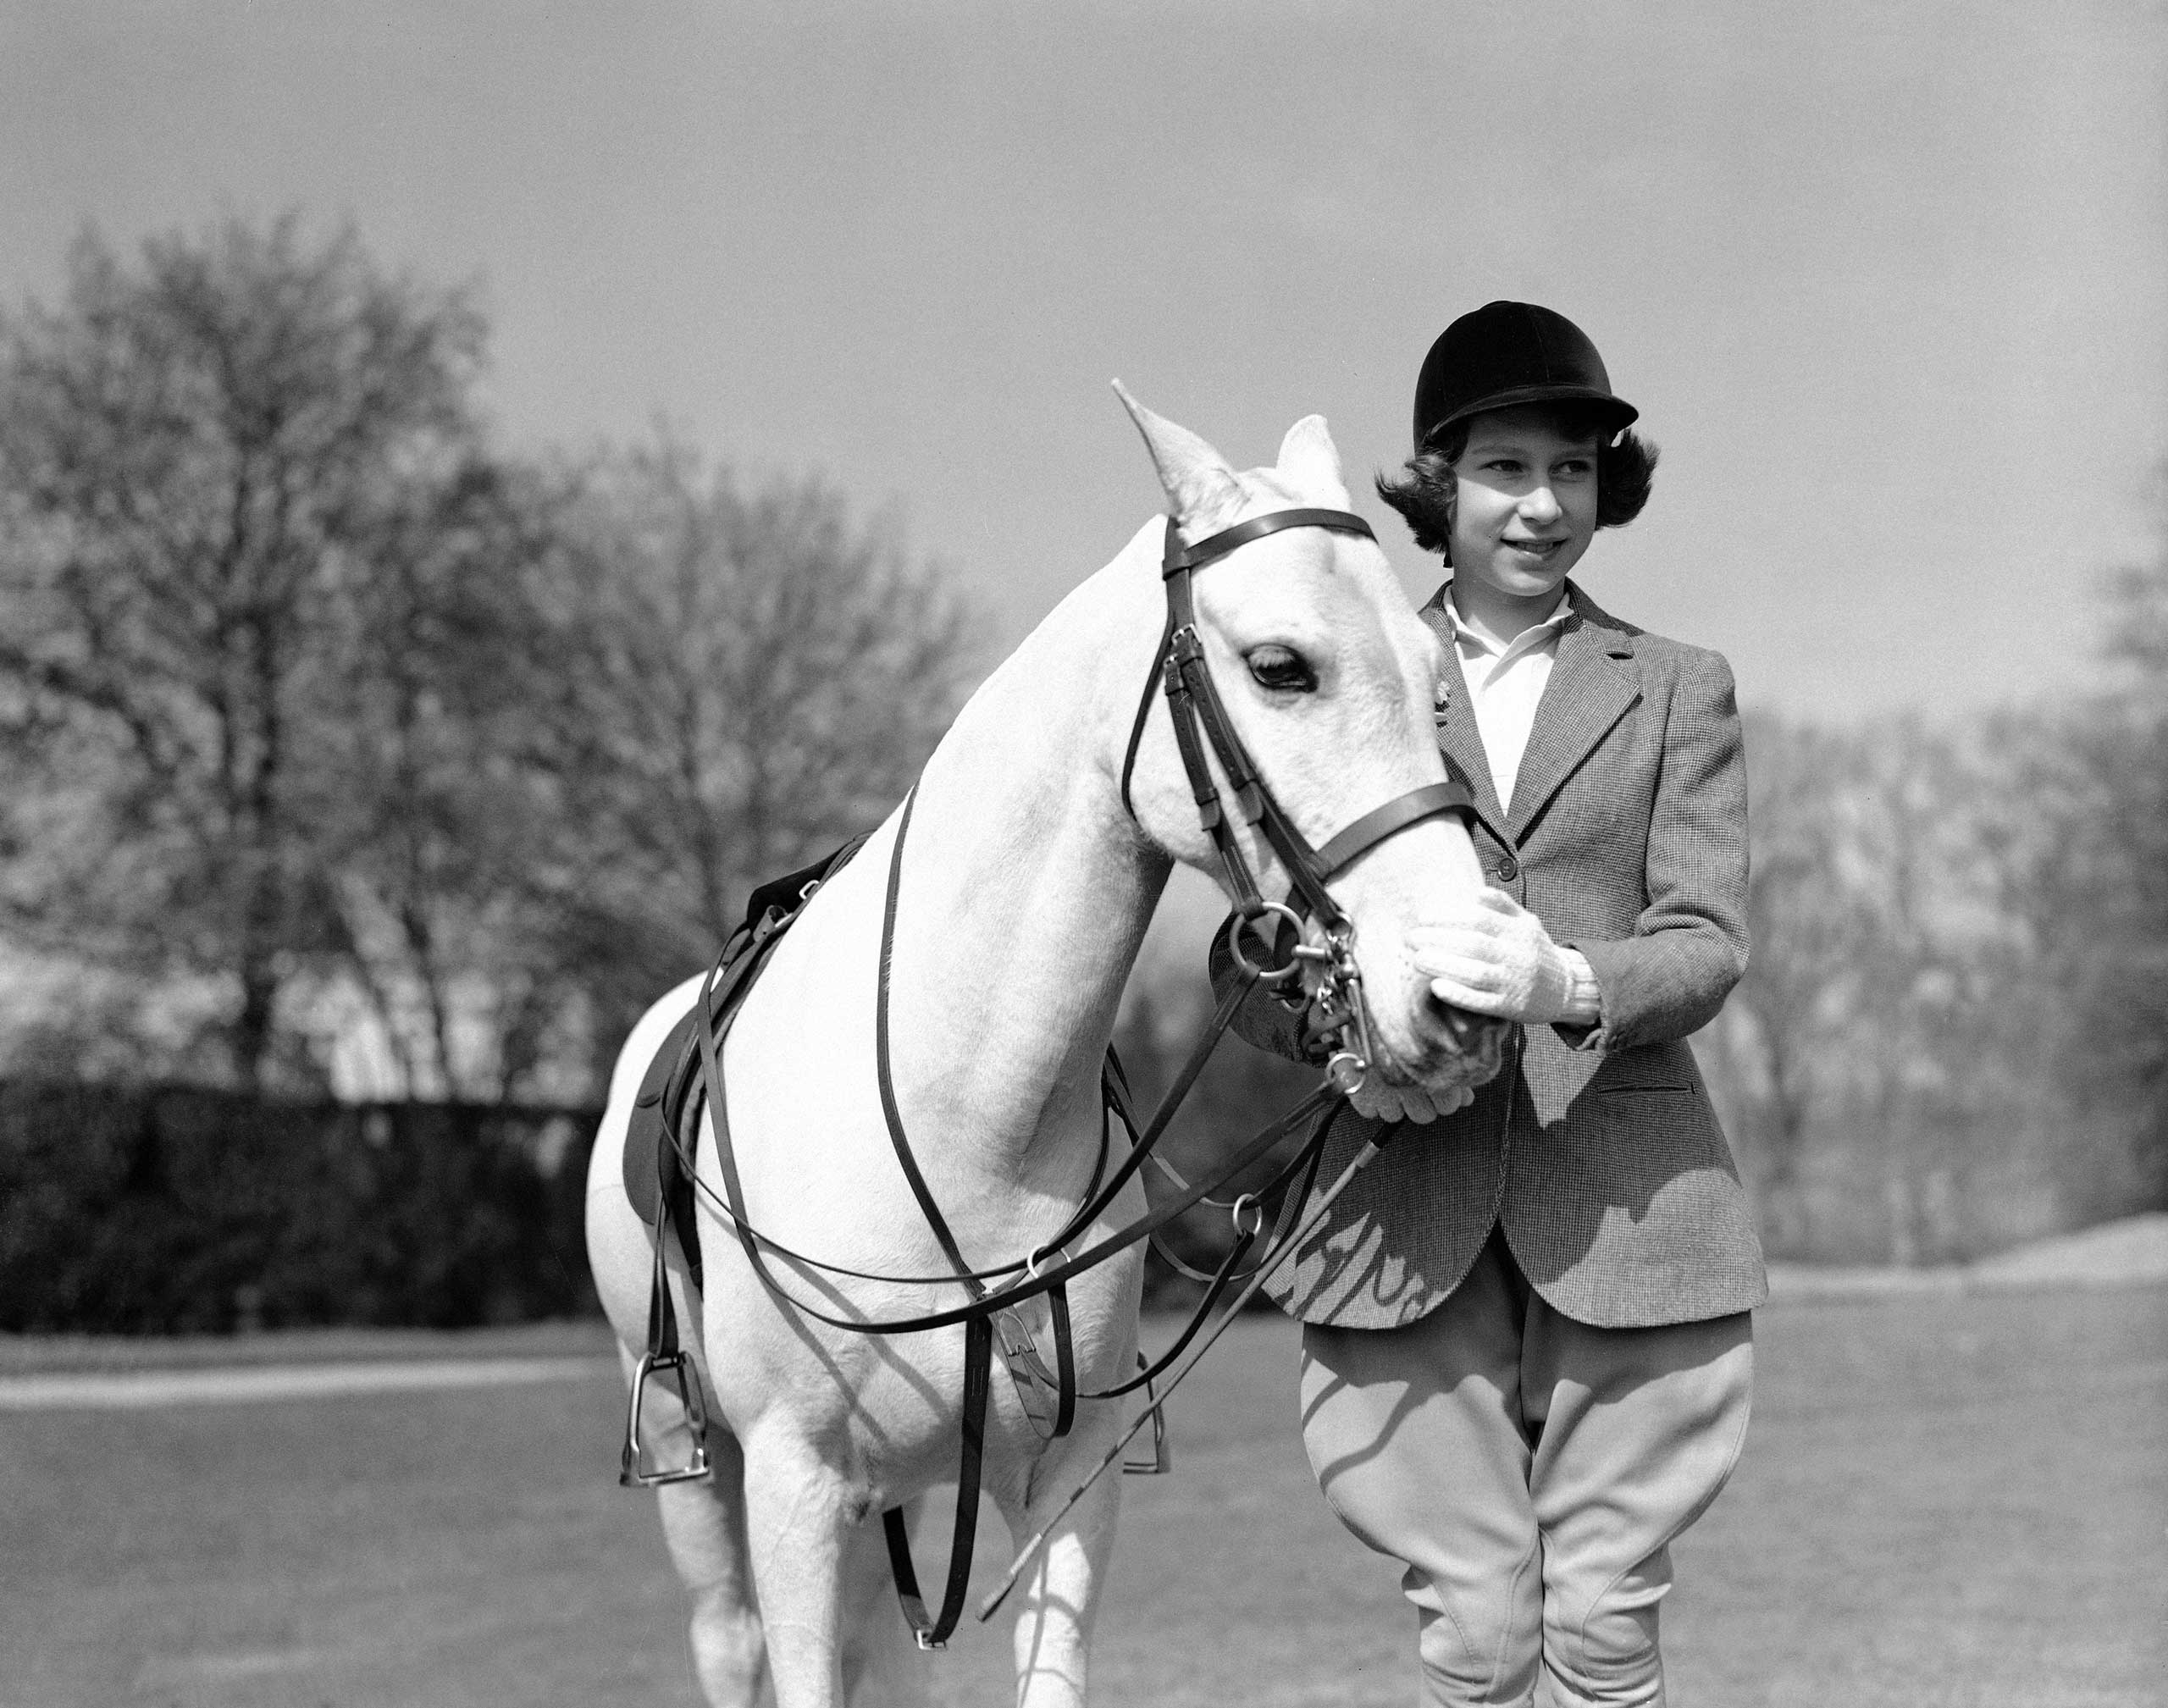 Then-Princess Elizabeth on her 13th birthday in April 1939.